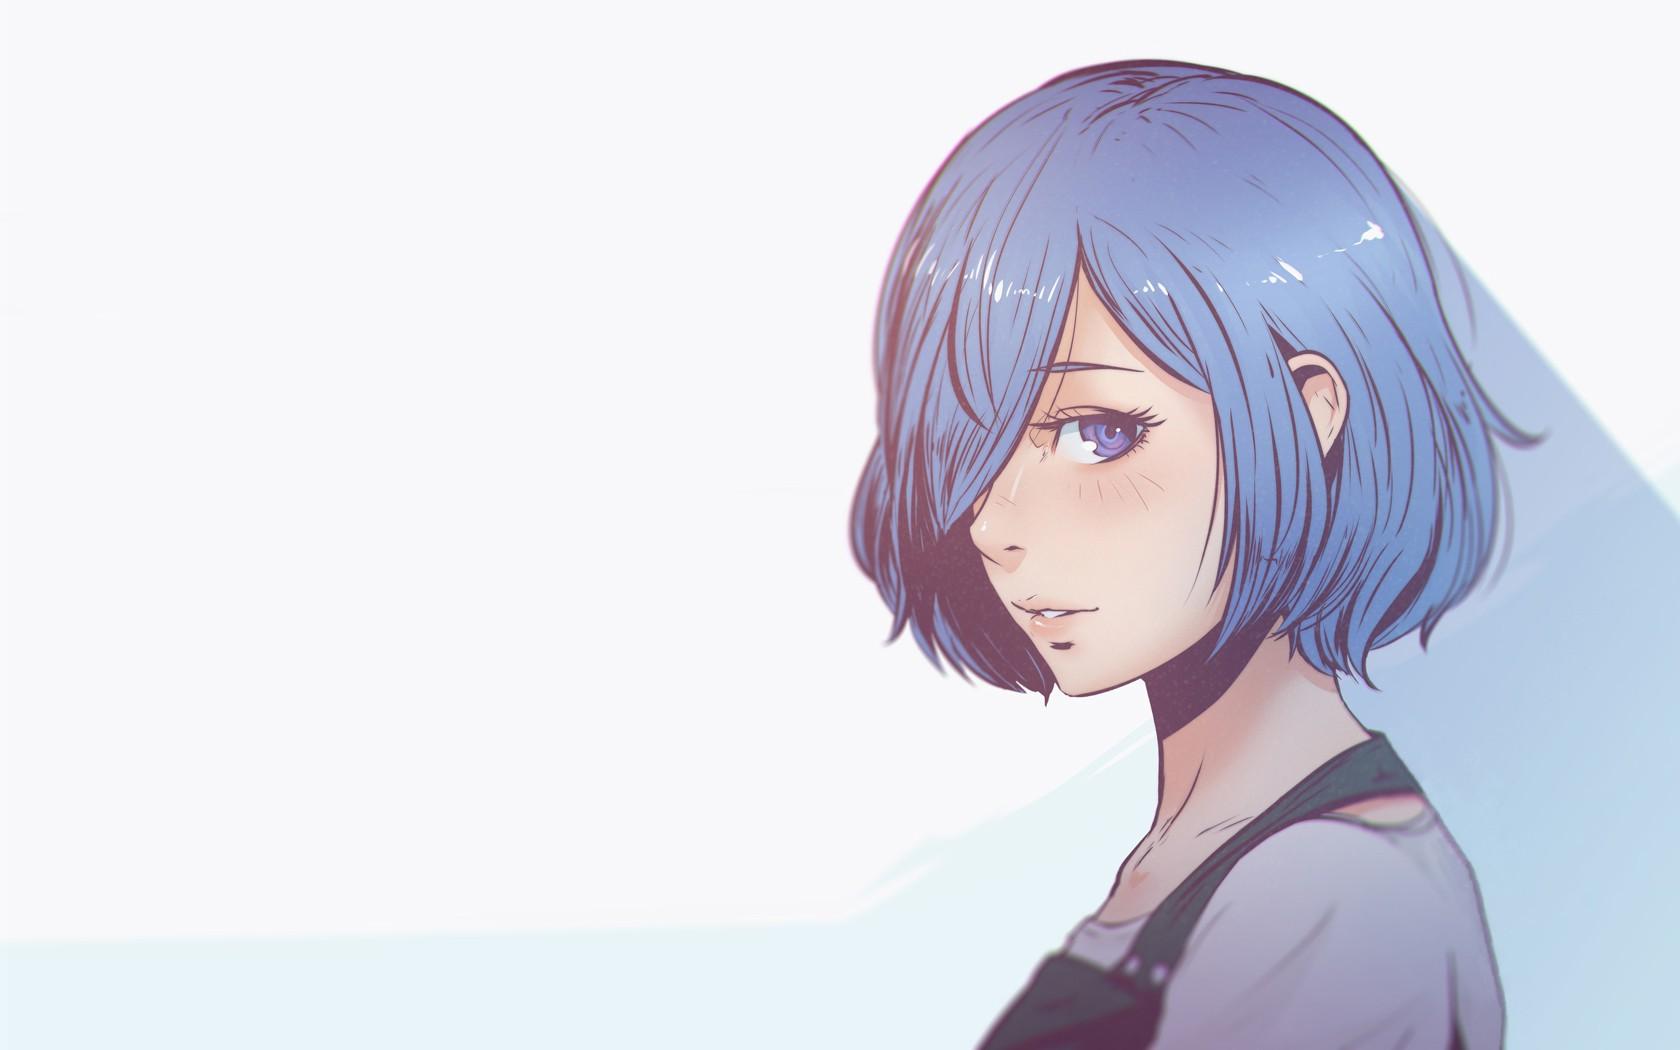 Wallpaper Latar Belakang Yang Sederhana Gadis Anime